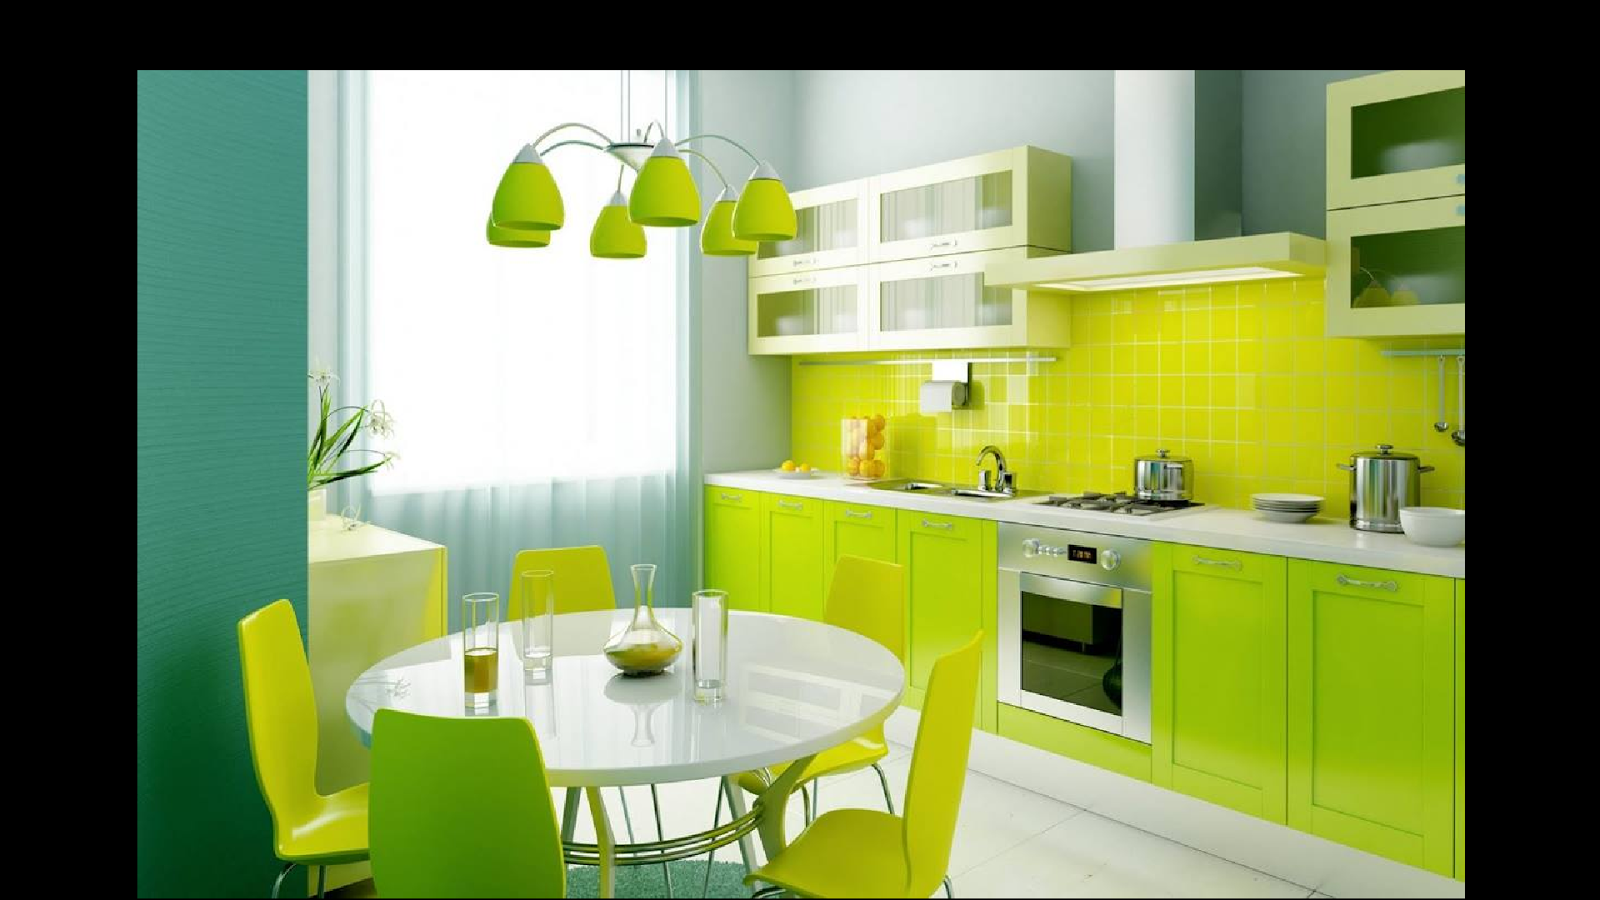 Interior Design  screenshot. Interior Design   Android Apps on Google Play